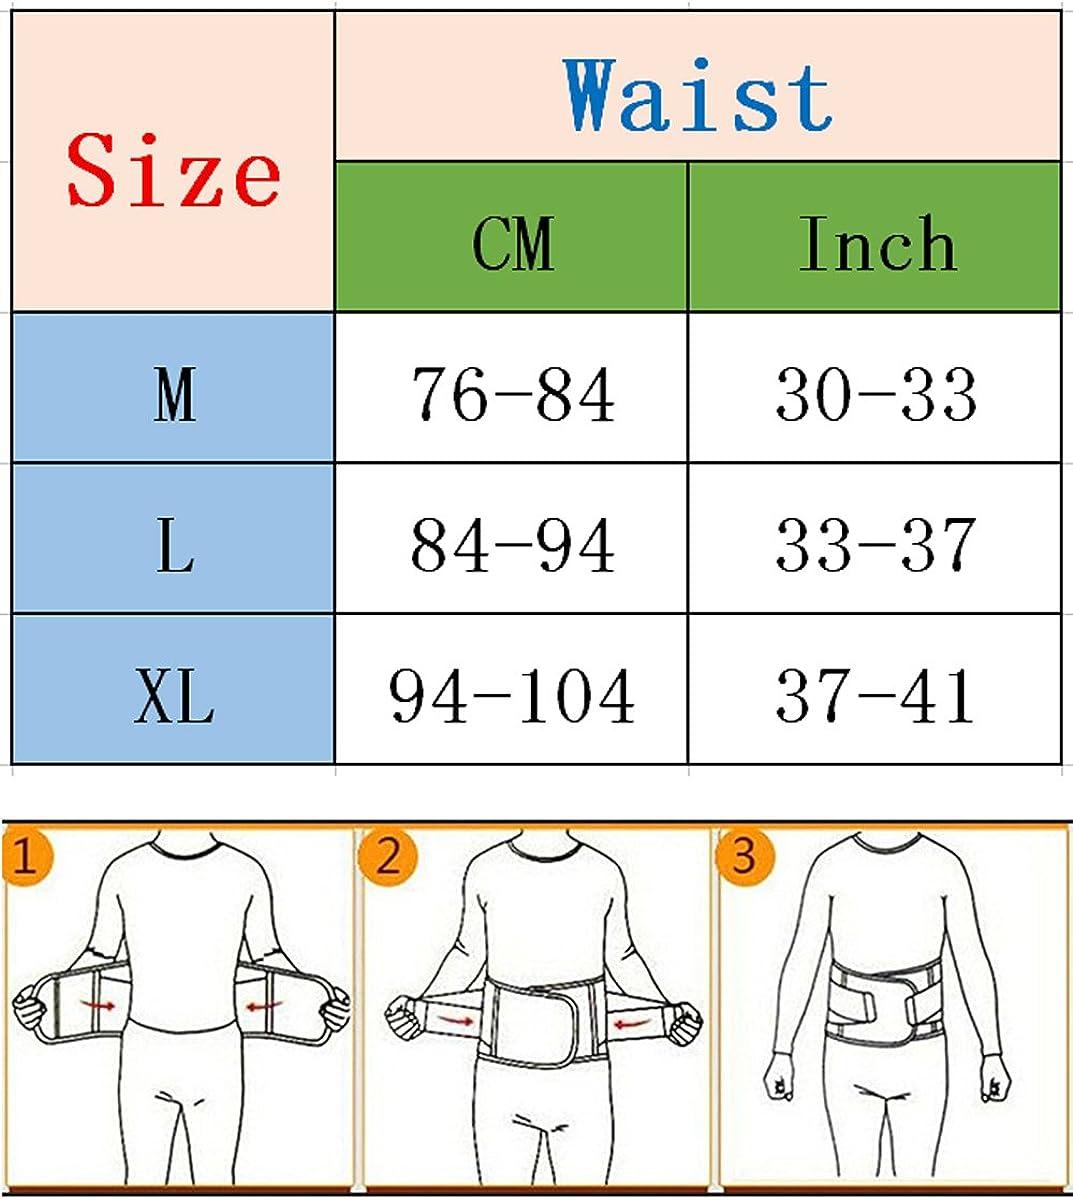 FLORATA Waist Trainer Cincher Control Underbust Shaper Corset Shapewear Body Tummy Sport